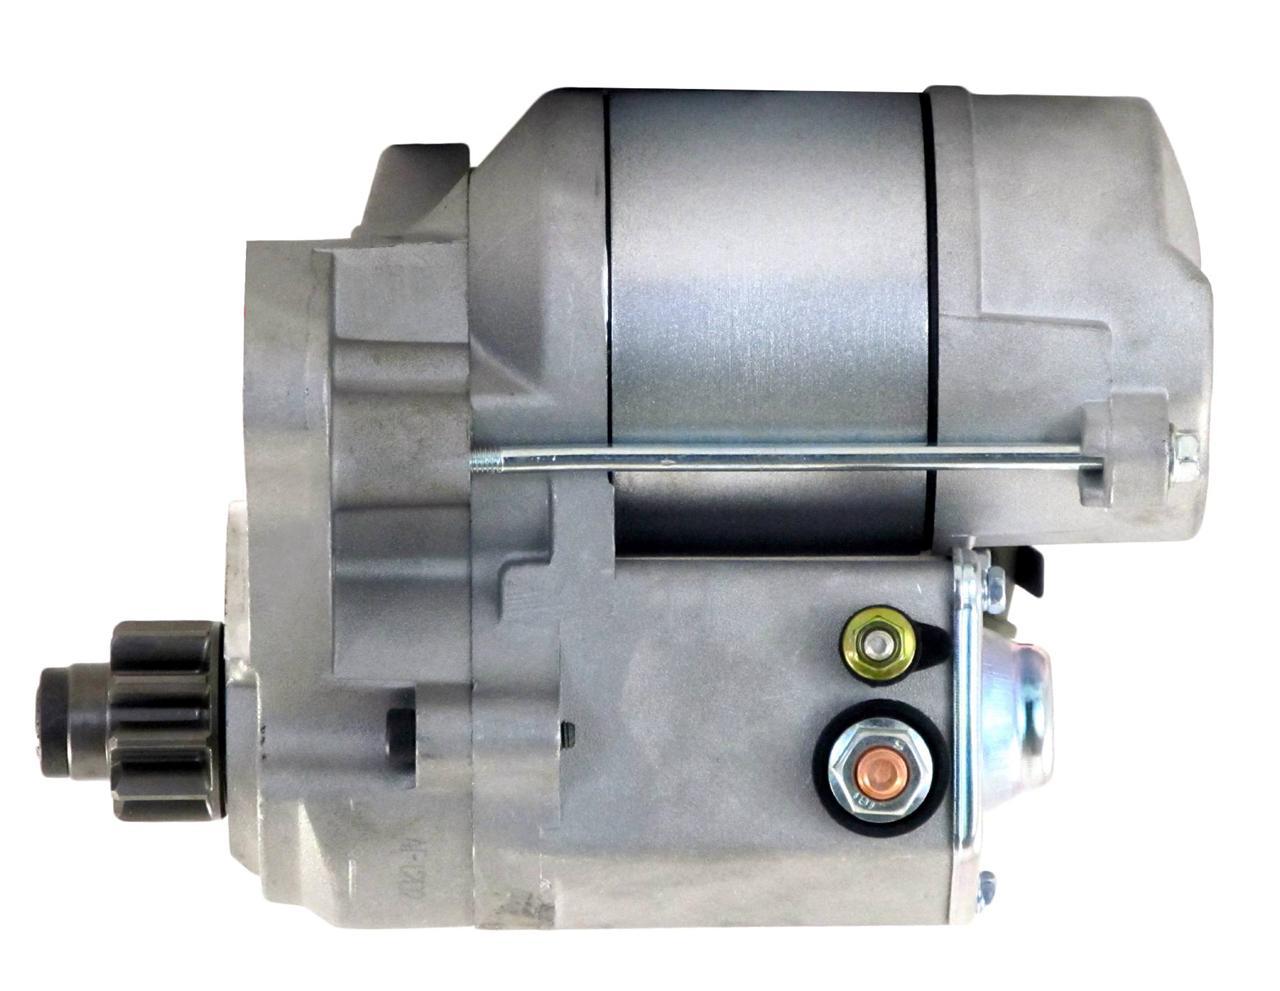 new high performance starter motor mopar chysler dodge engines  new high performance starter motor mopar chysler dodge engines 318 340 360 361